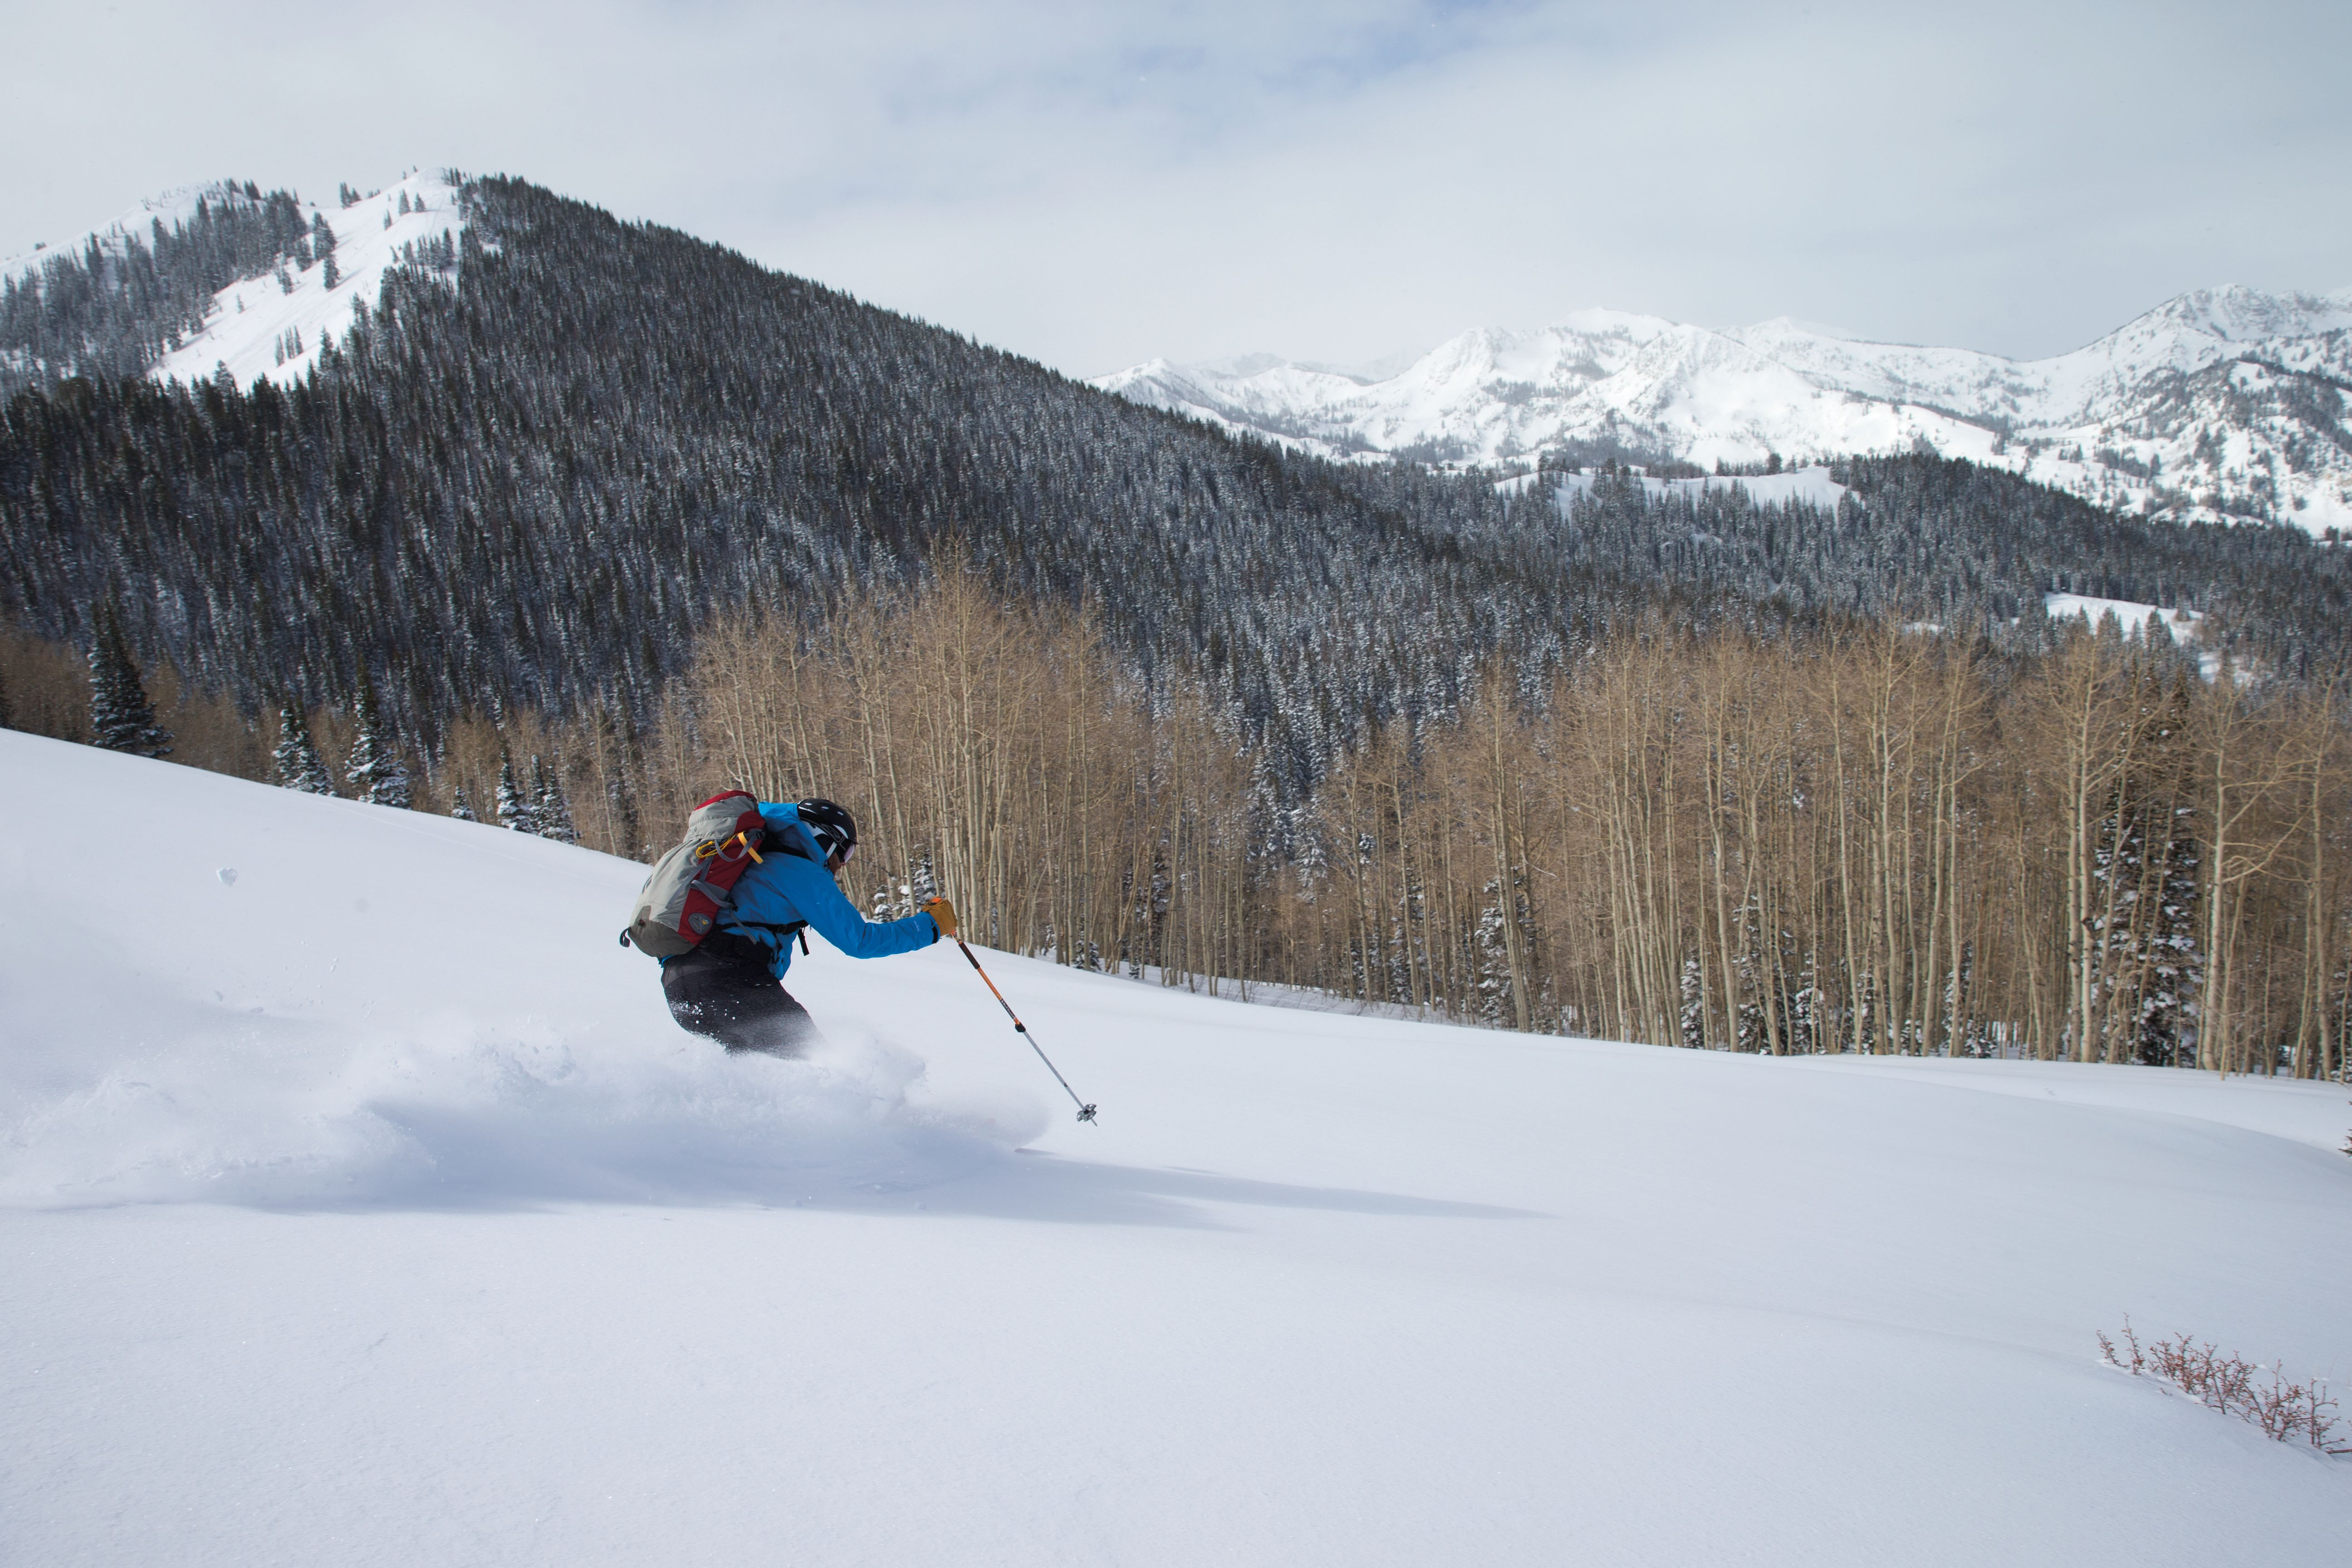 Pcwi 14 interconnect powder skiing rmqeou